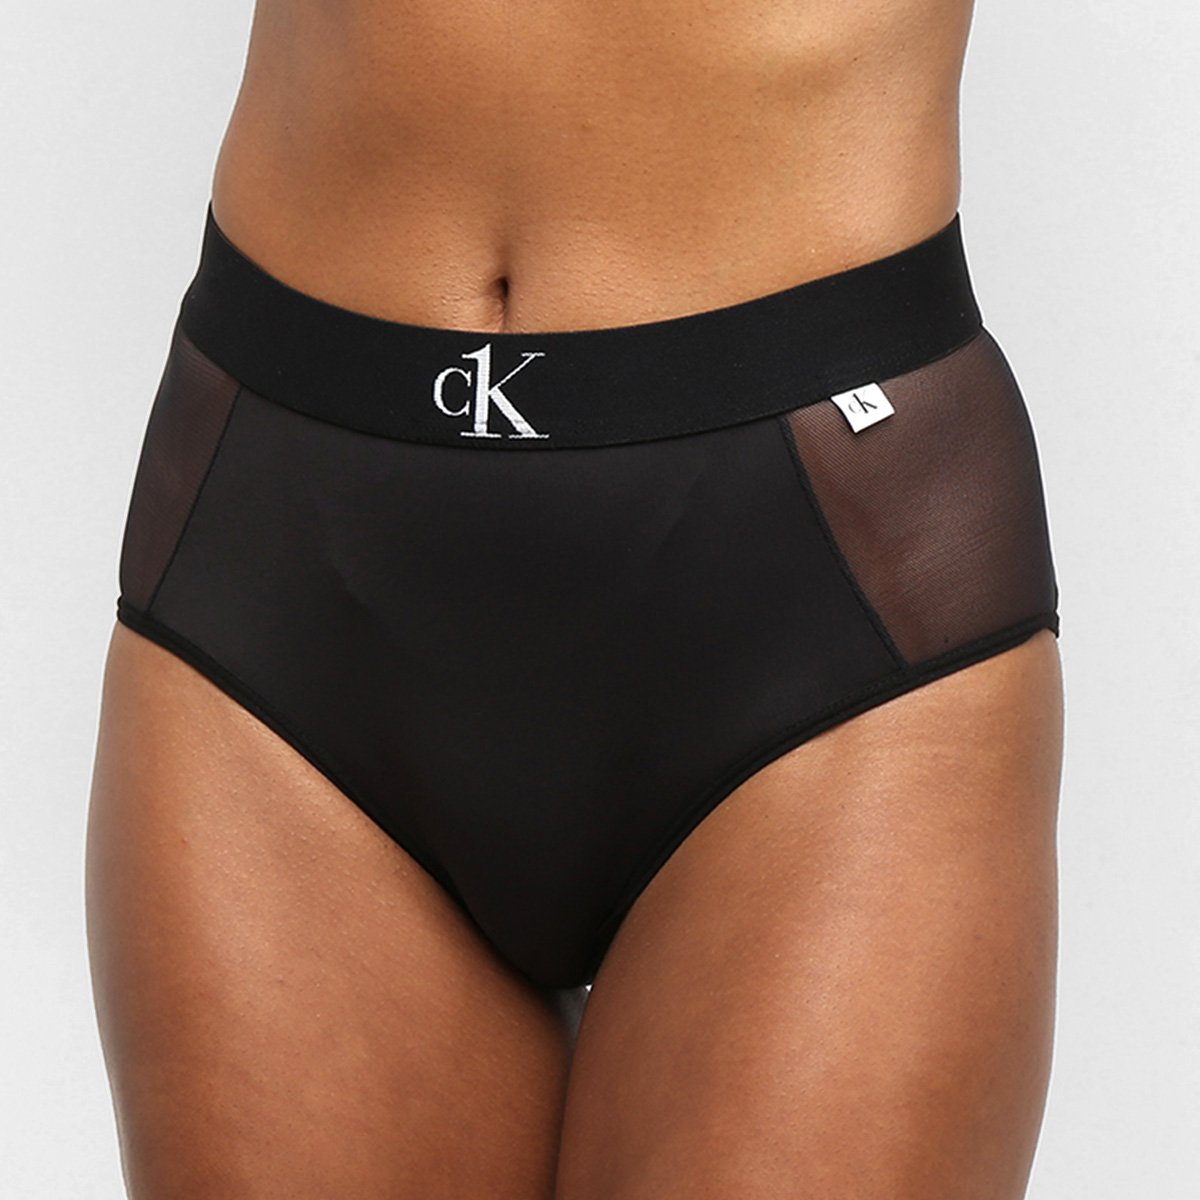 Calcinha Calvin Klein Hot Pant Tule Microfibra